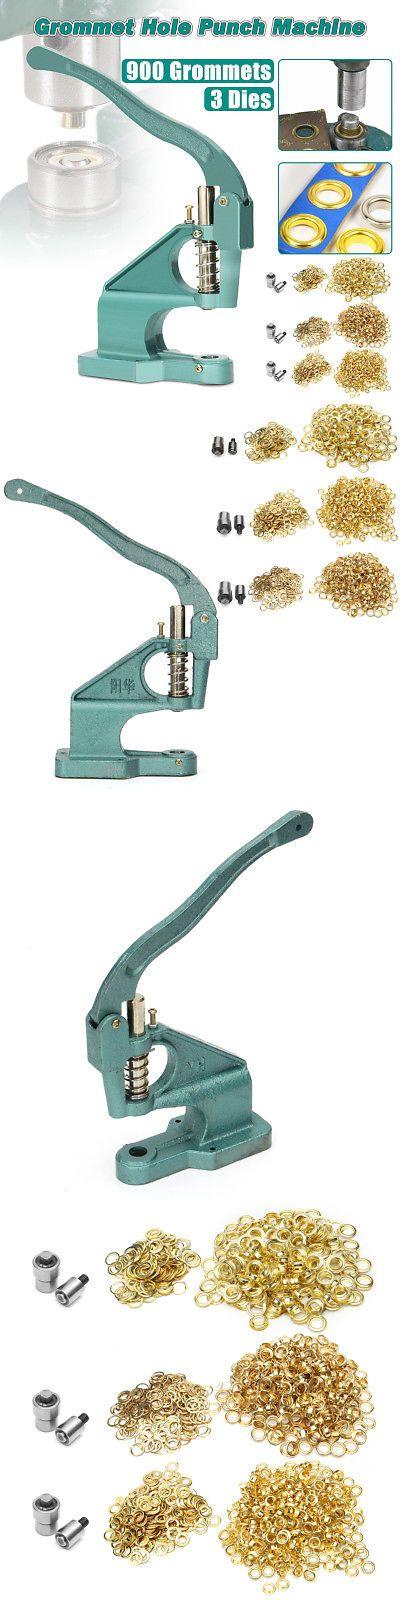 Eyelets 28137: Green Eyelet Hole Punch Machine Hand Press Steel